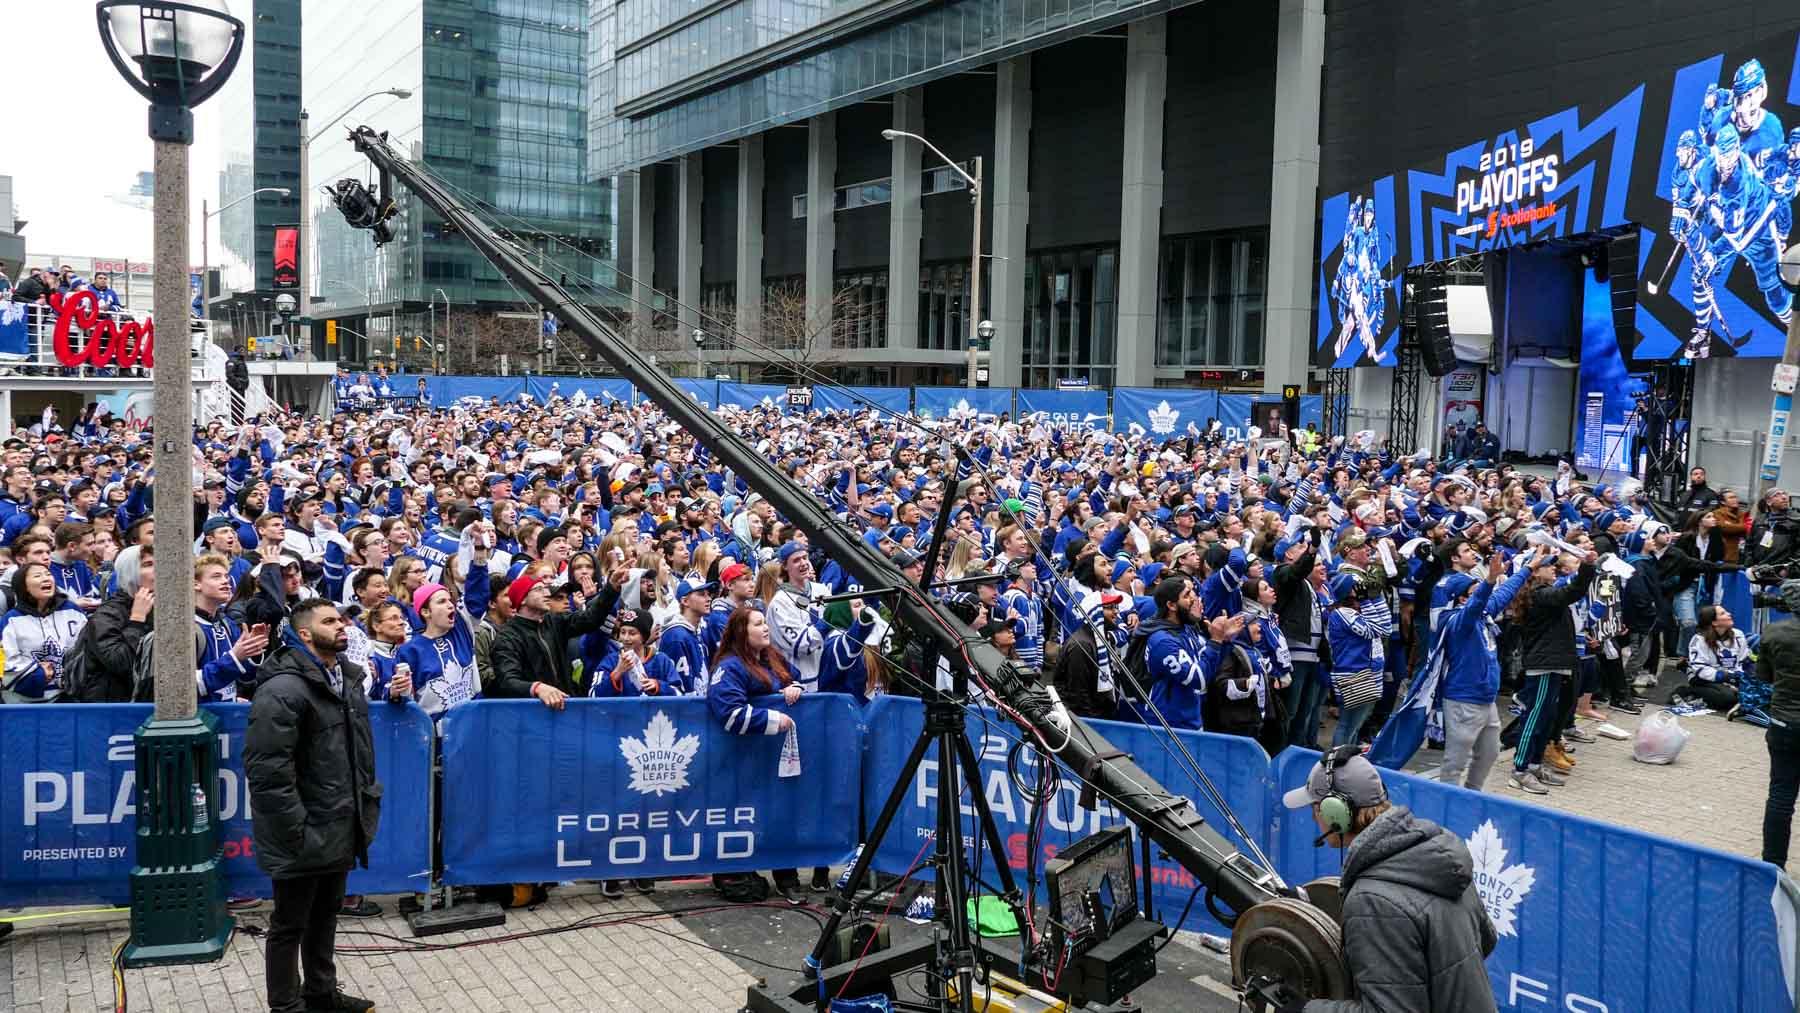 Toronto-Maple-Leafs-Playoffs-Tailgate-Scotiabank-Arena-Jib-Operator